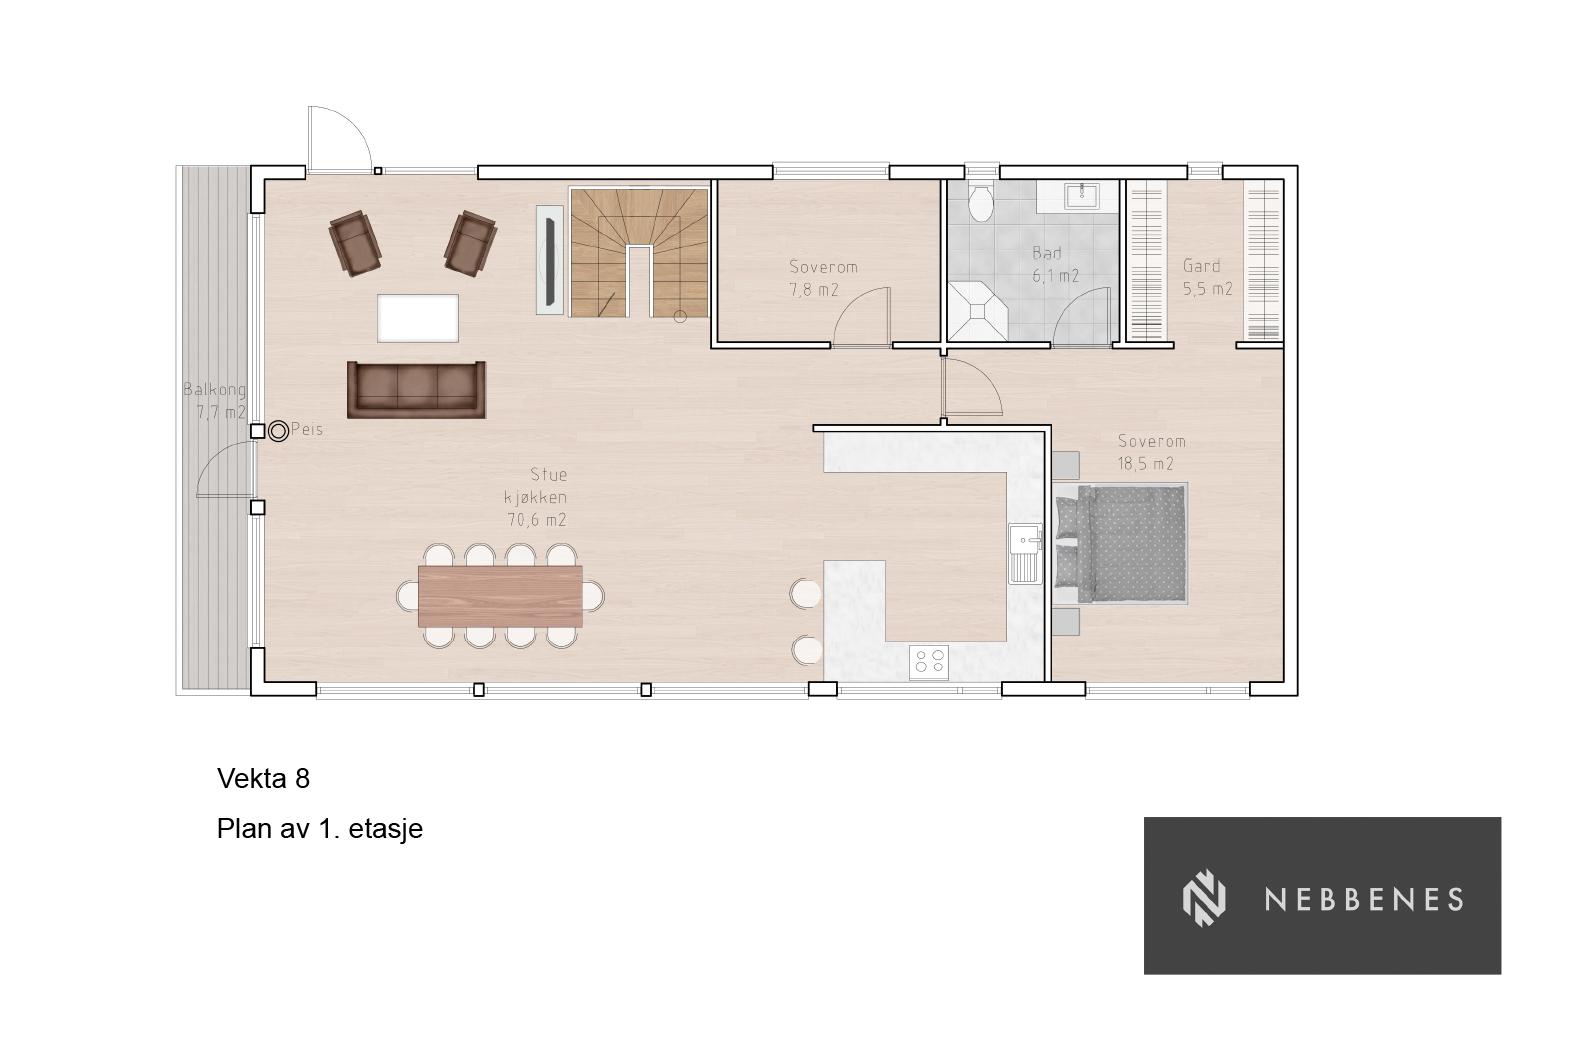 Vekta 8_2D-1-etasje.jpg